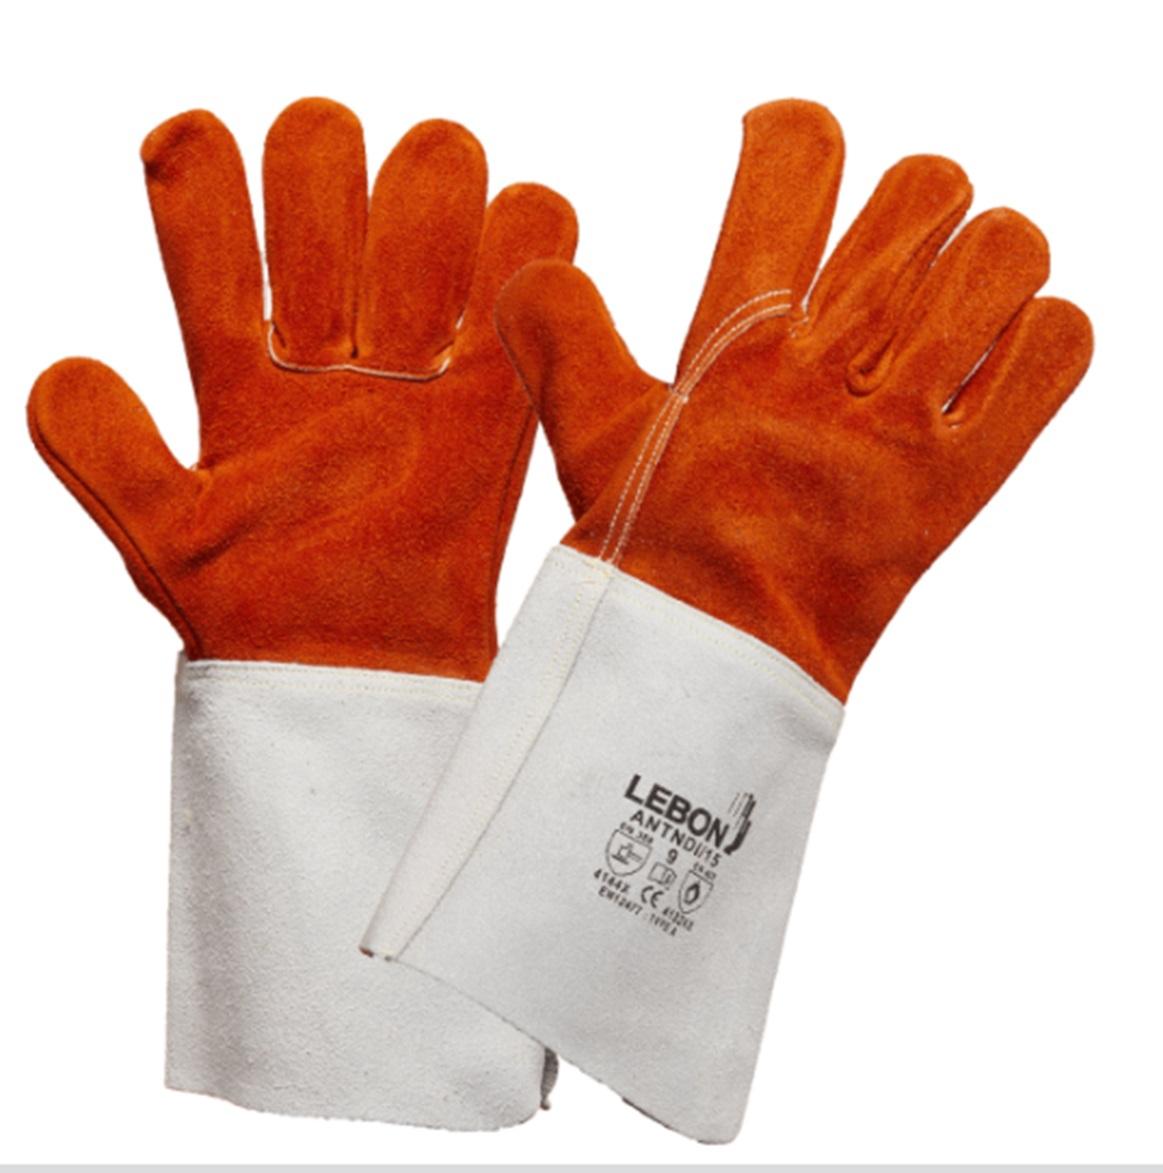 Gants de soudeur ANTNDI/15 - Traité anti-chaleur Lebon Protection